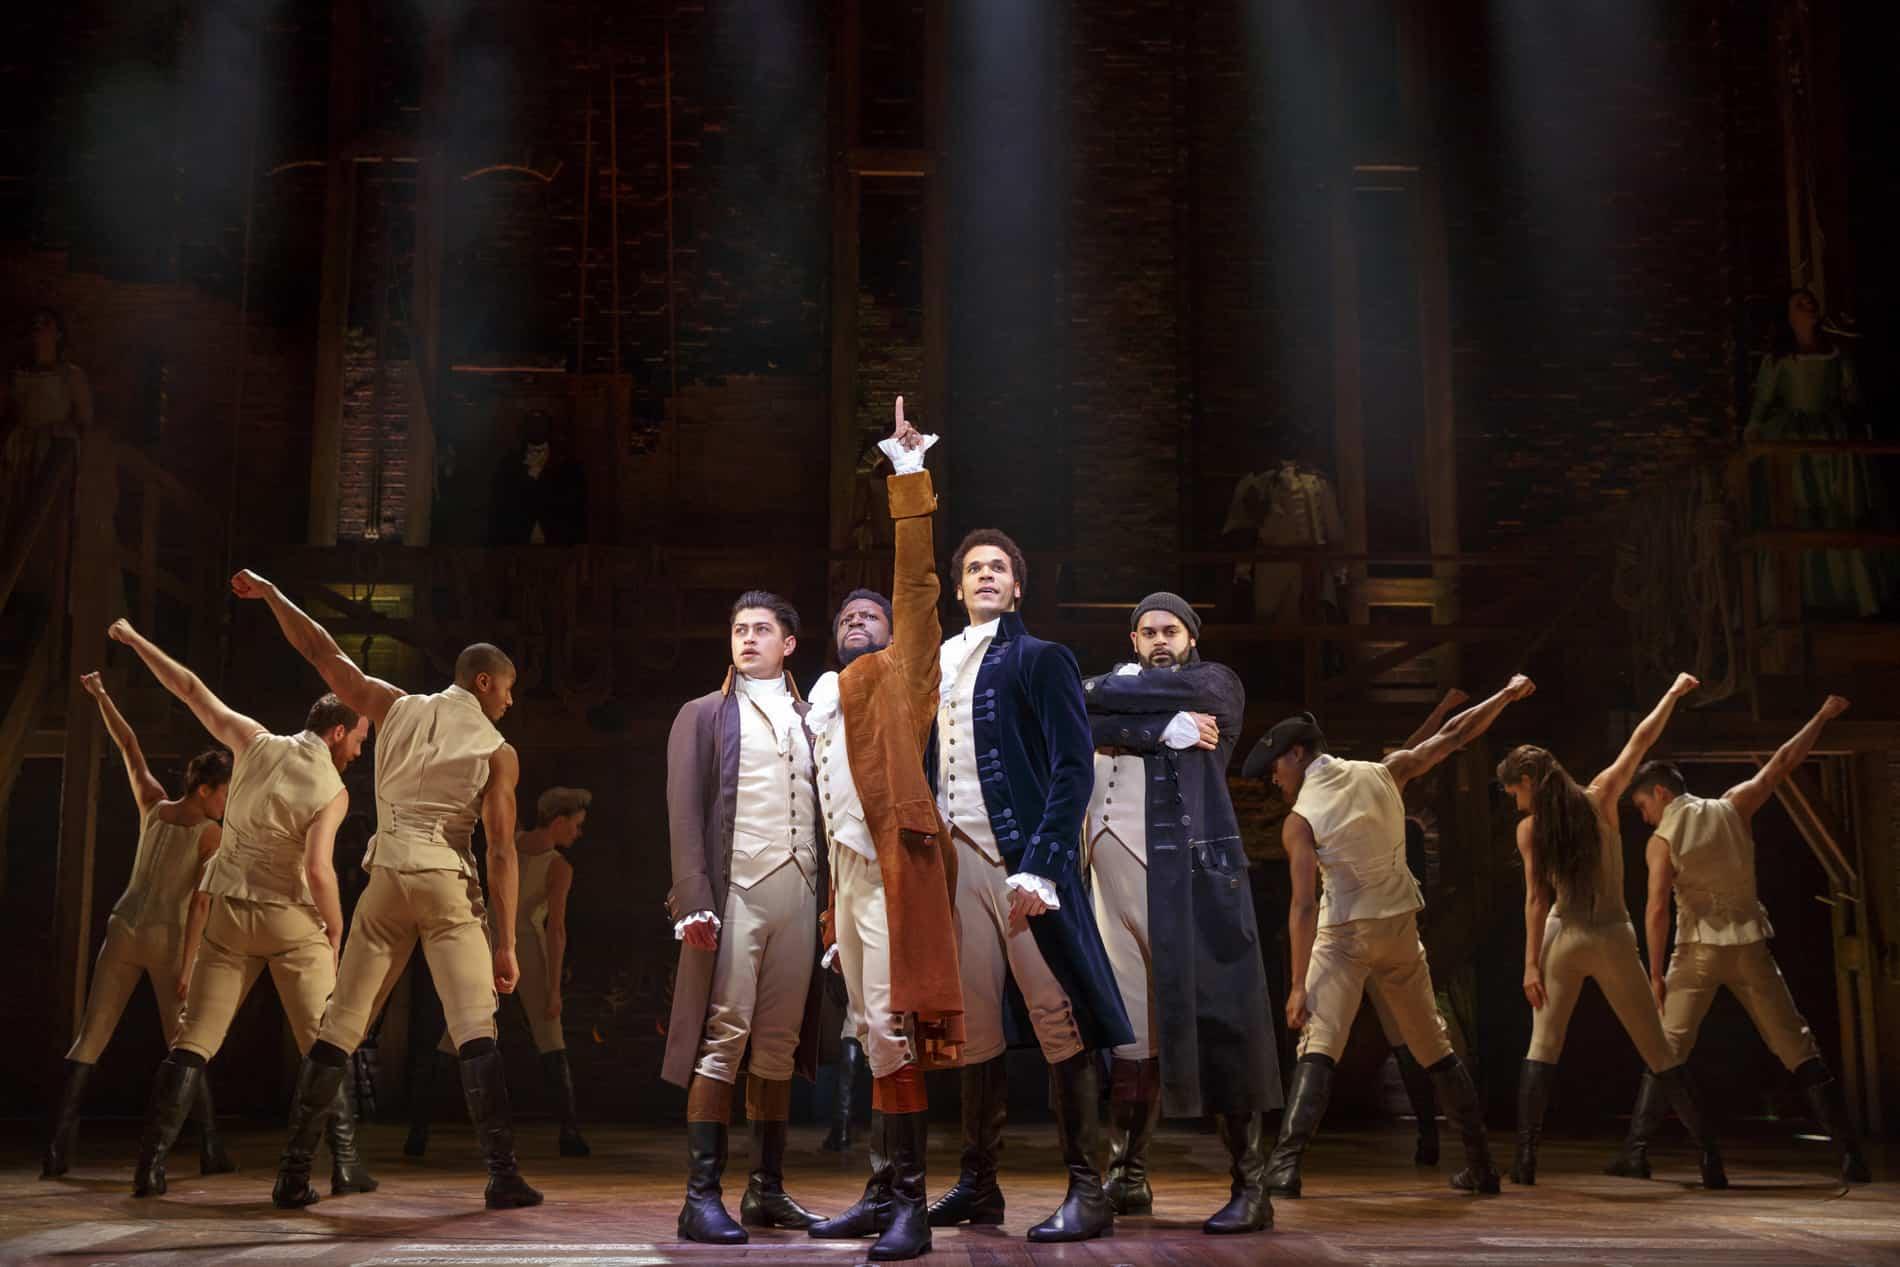 Hamilton Musical Cast - Review